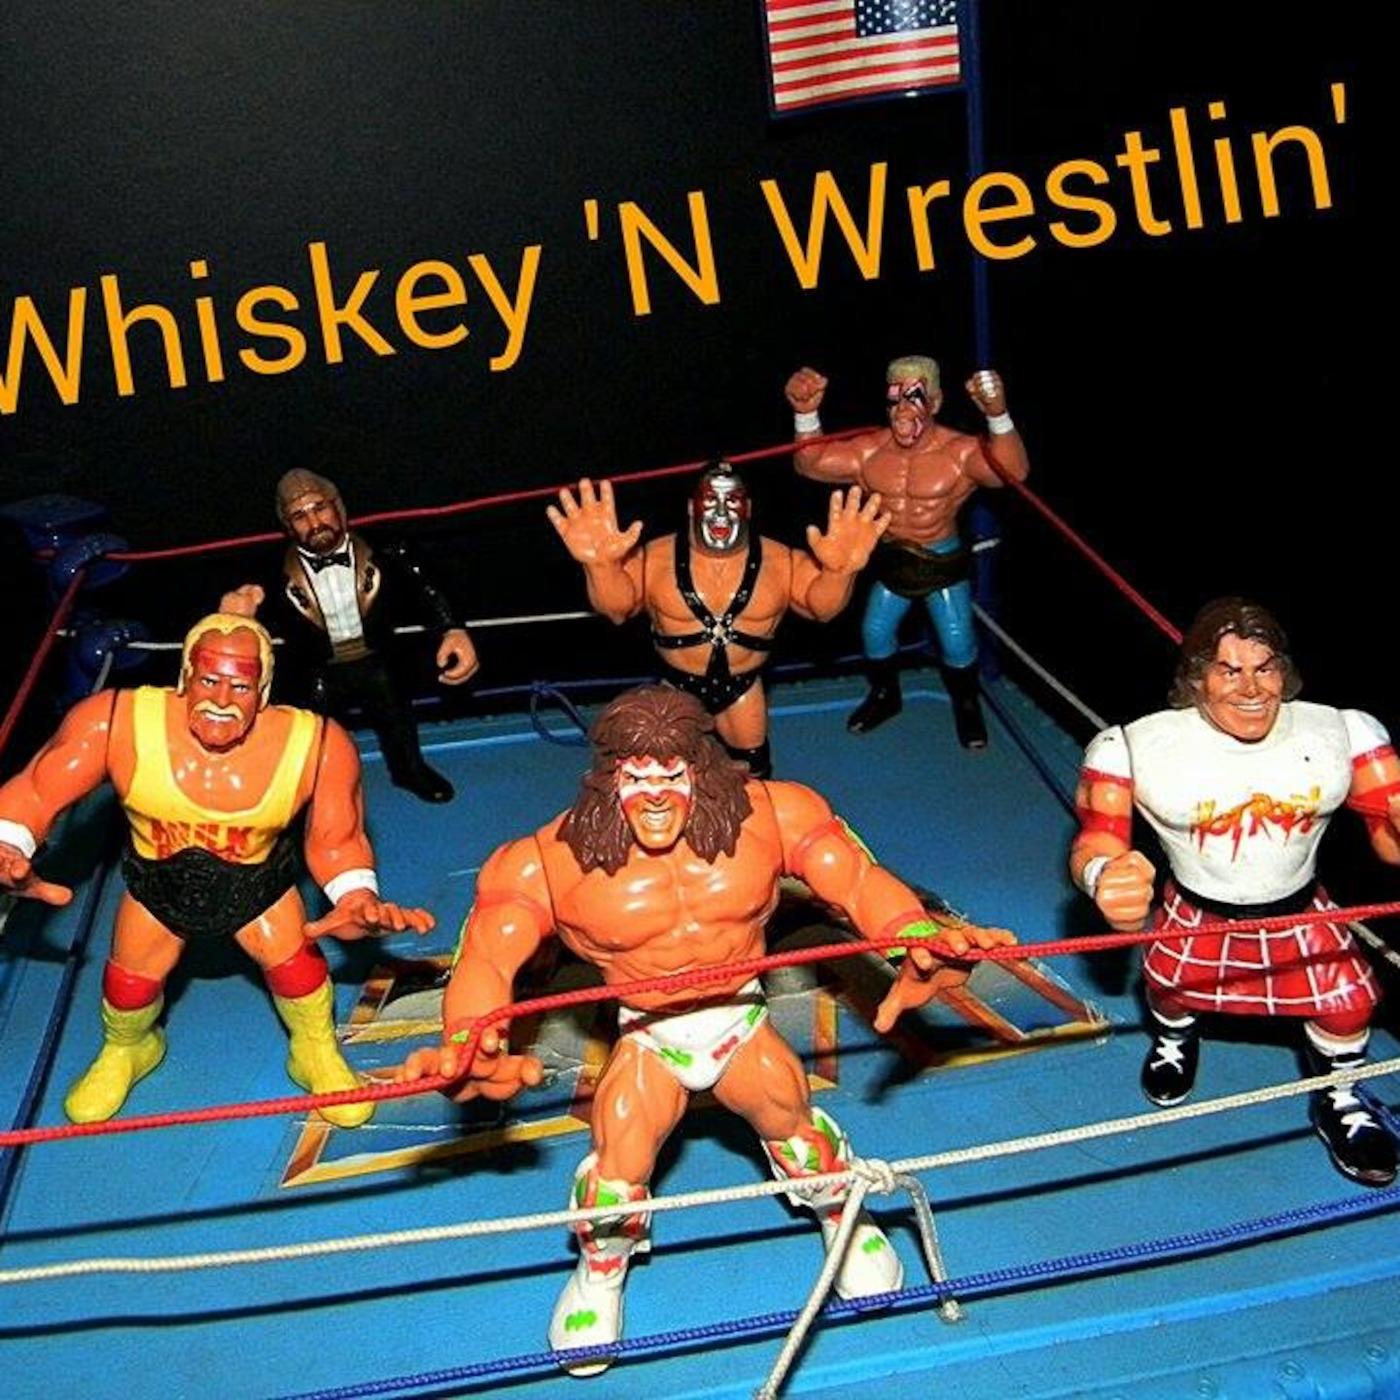 Whiskey N Wrestlin'